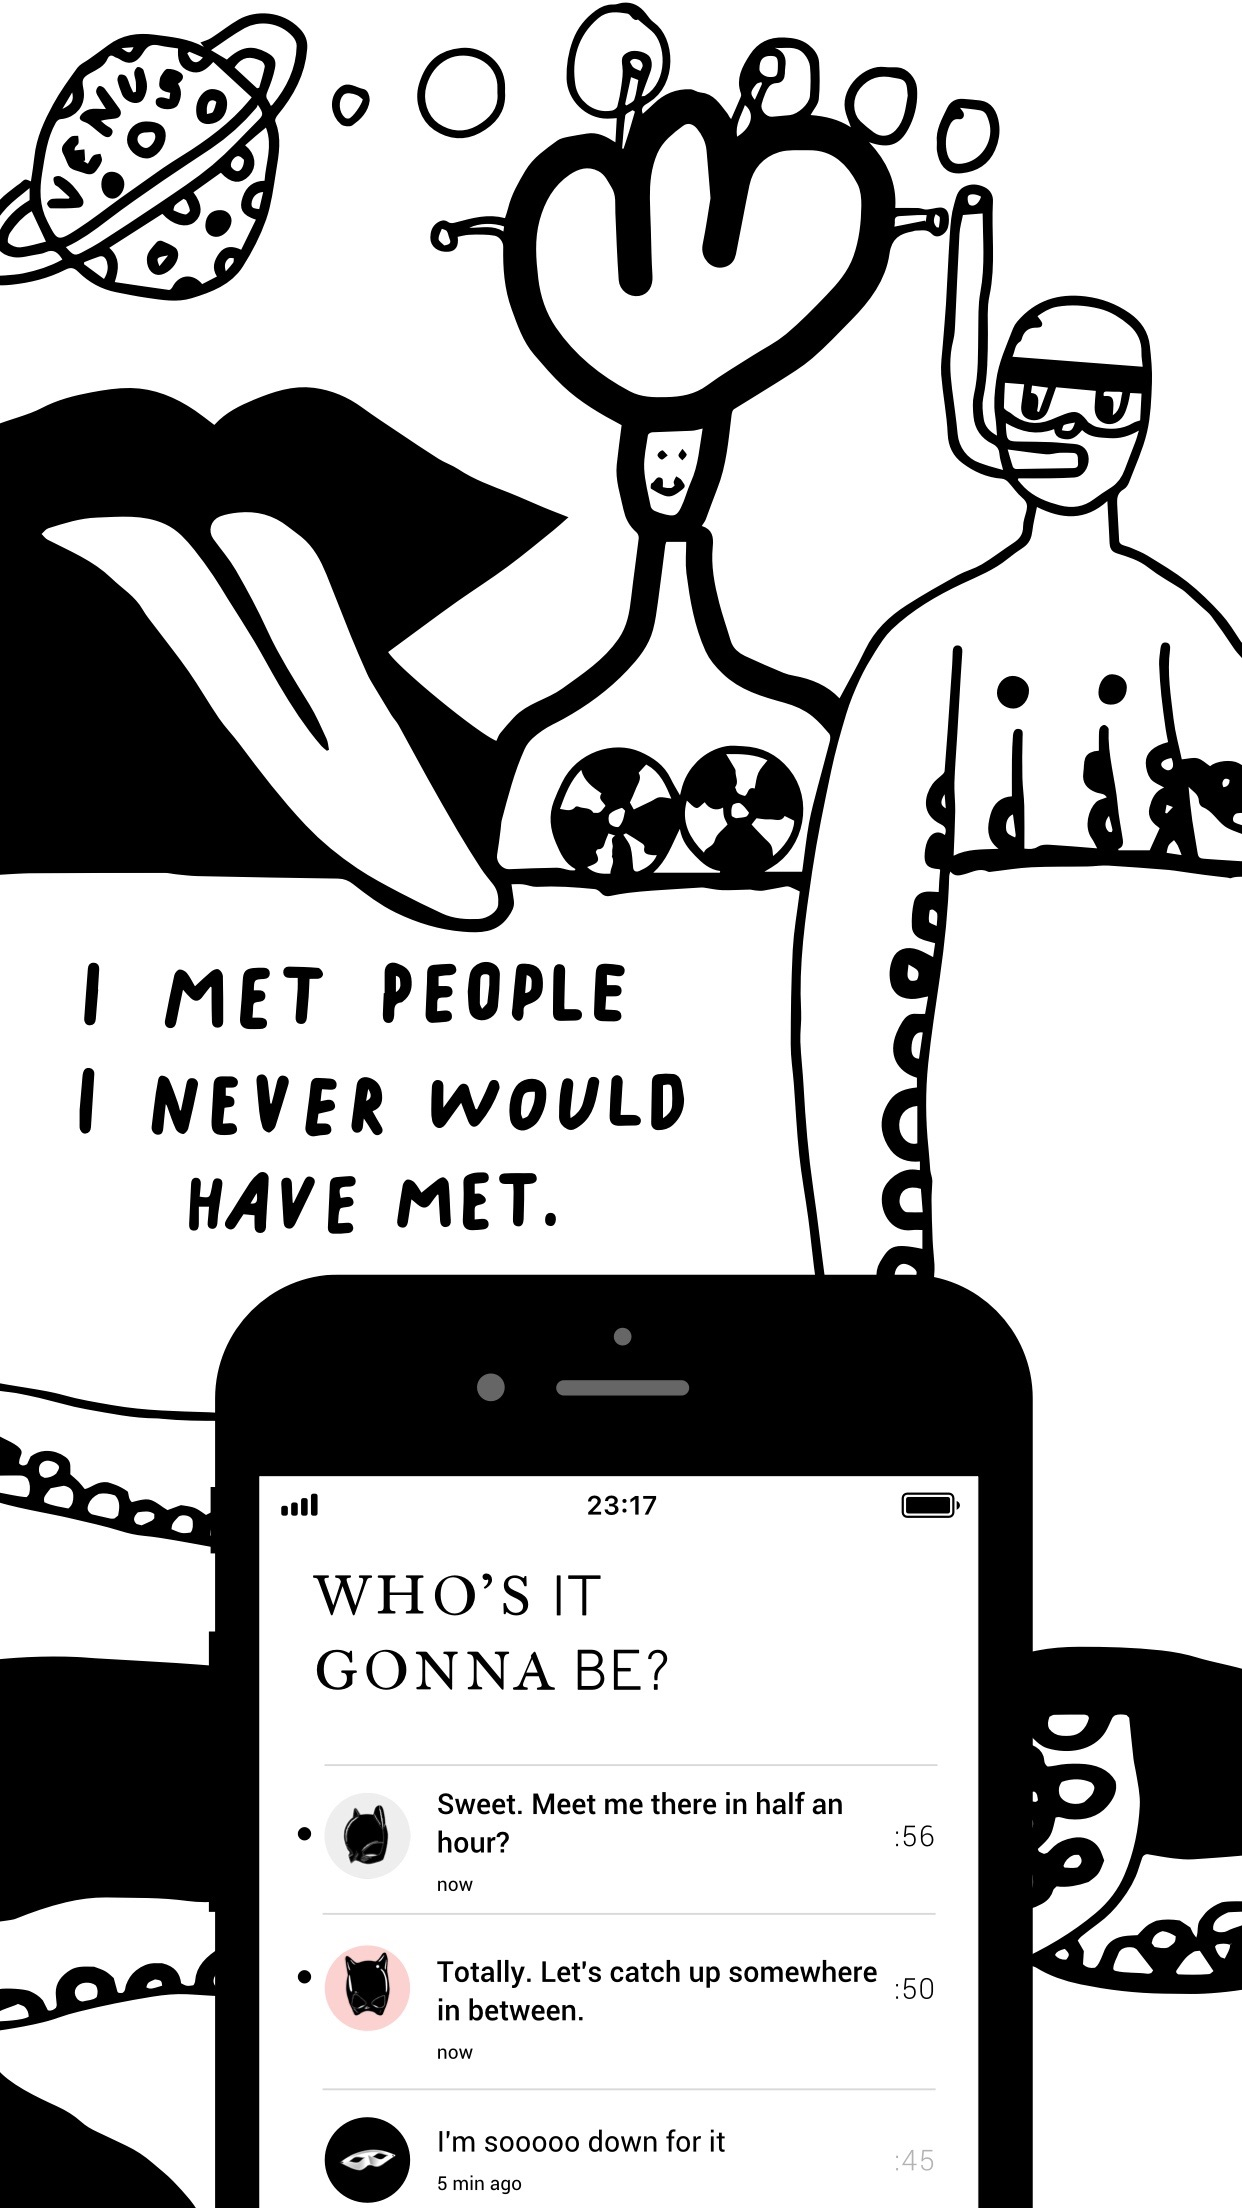 Pure anonymous hookup chat 18+ Screenshot